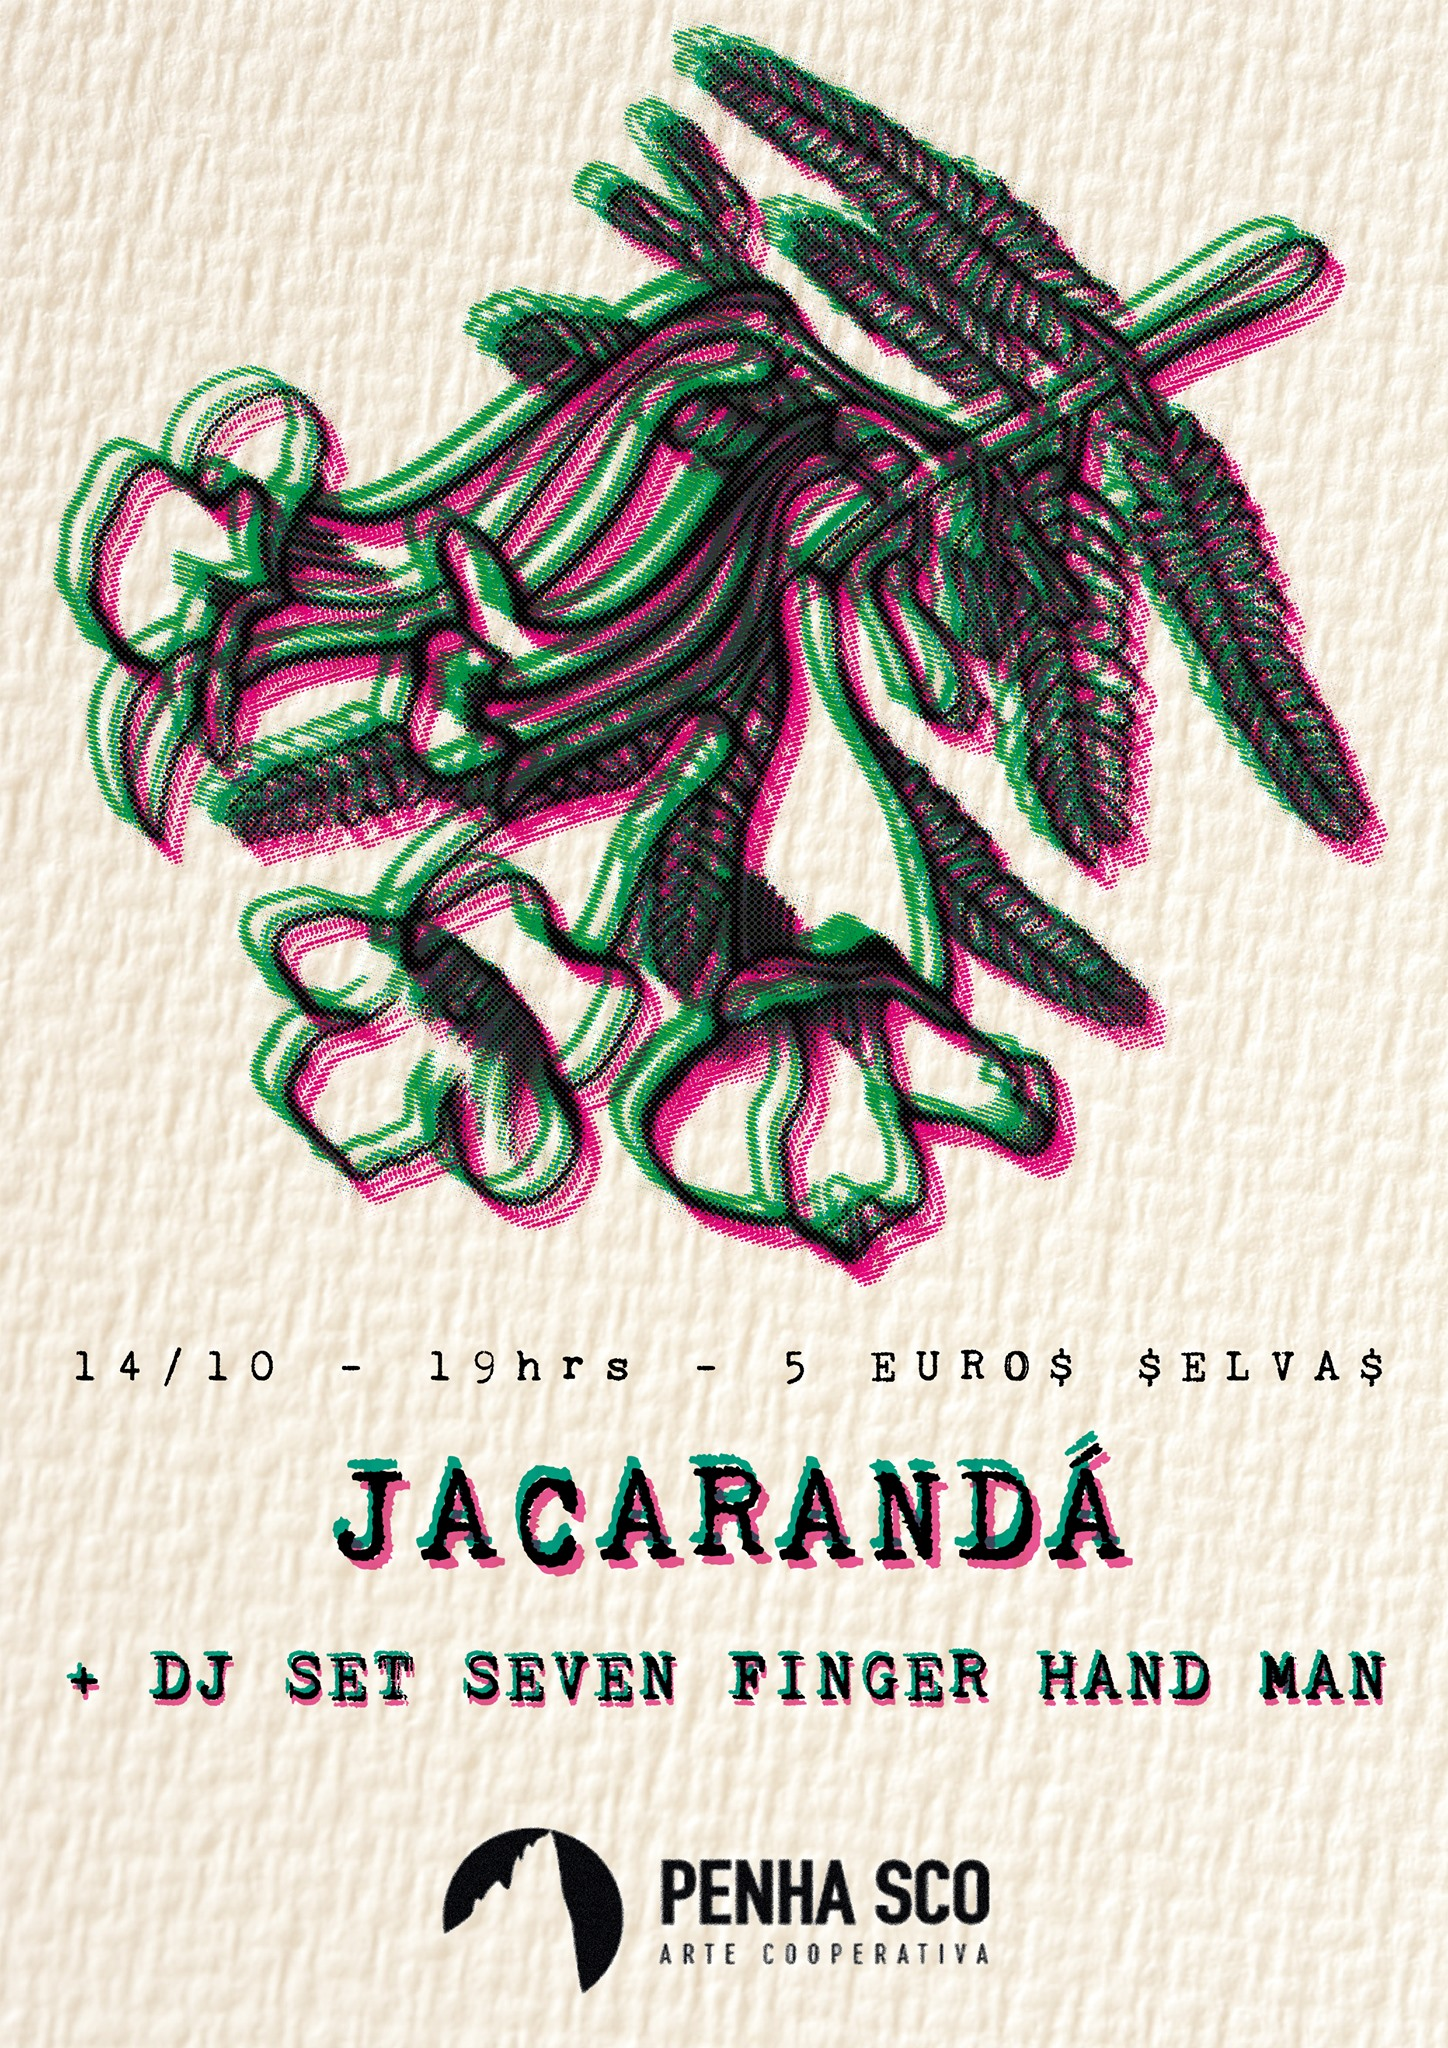 Jacarandá Ao vivo+ Dj Seven Finger Hand Maner @ Penha SCO